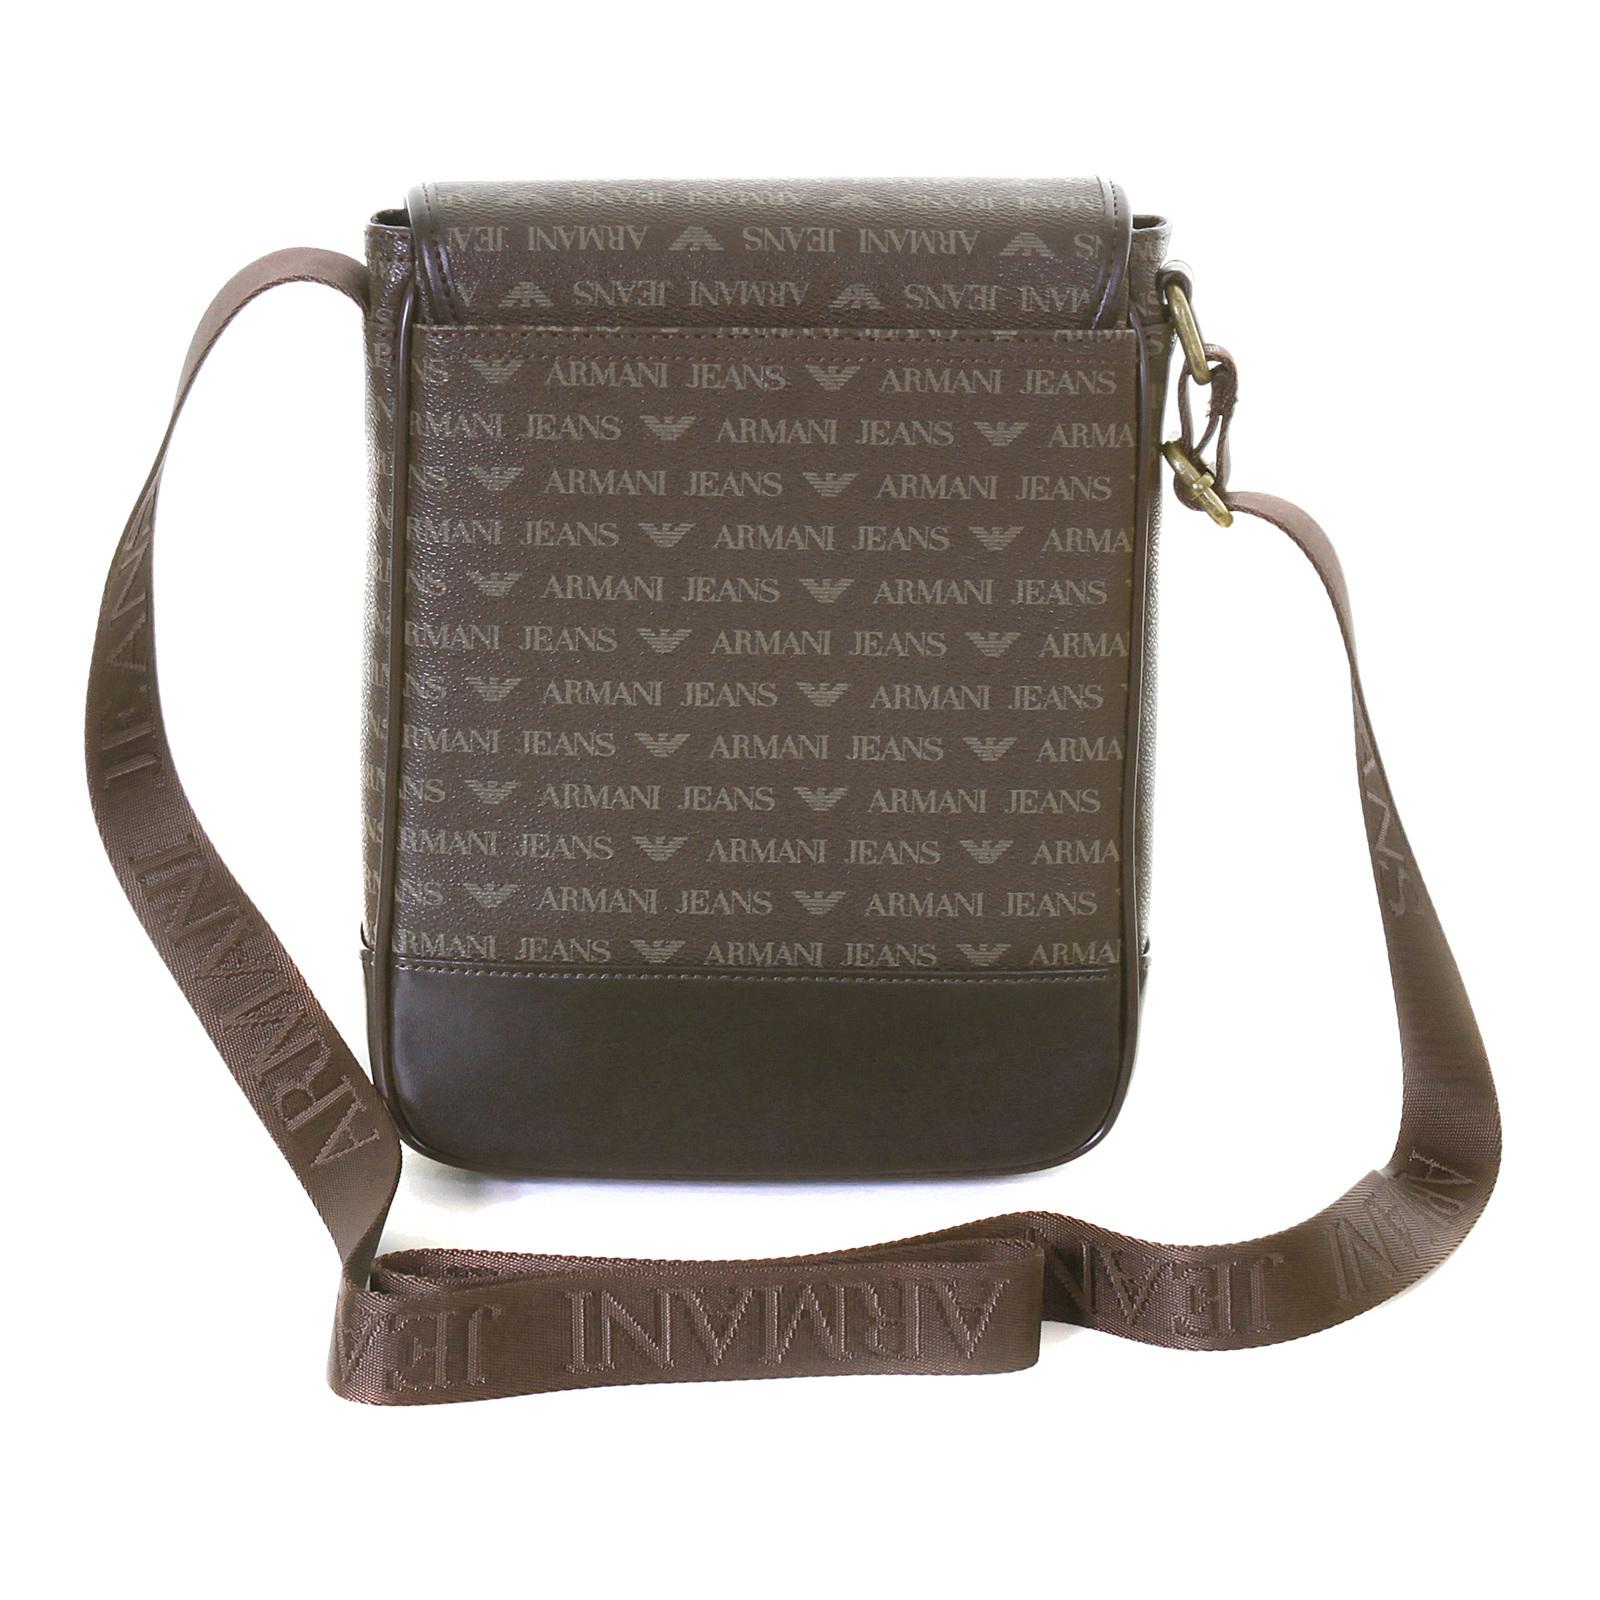 ab041dae9a2a Armani Jeans mens brown 06293 J4 logo messenger bag AJM2474 at ...